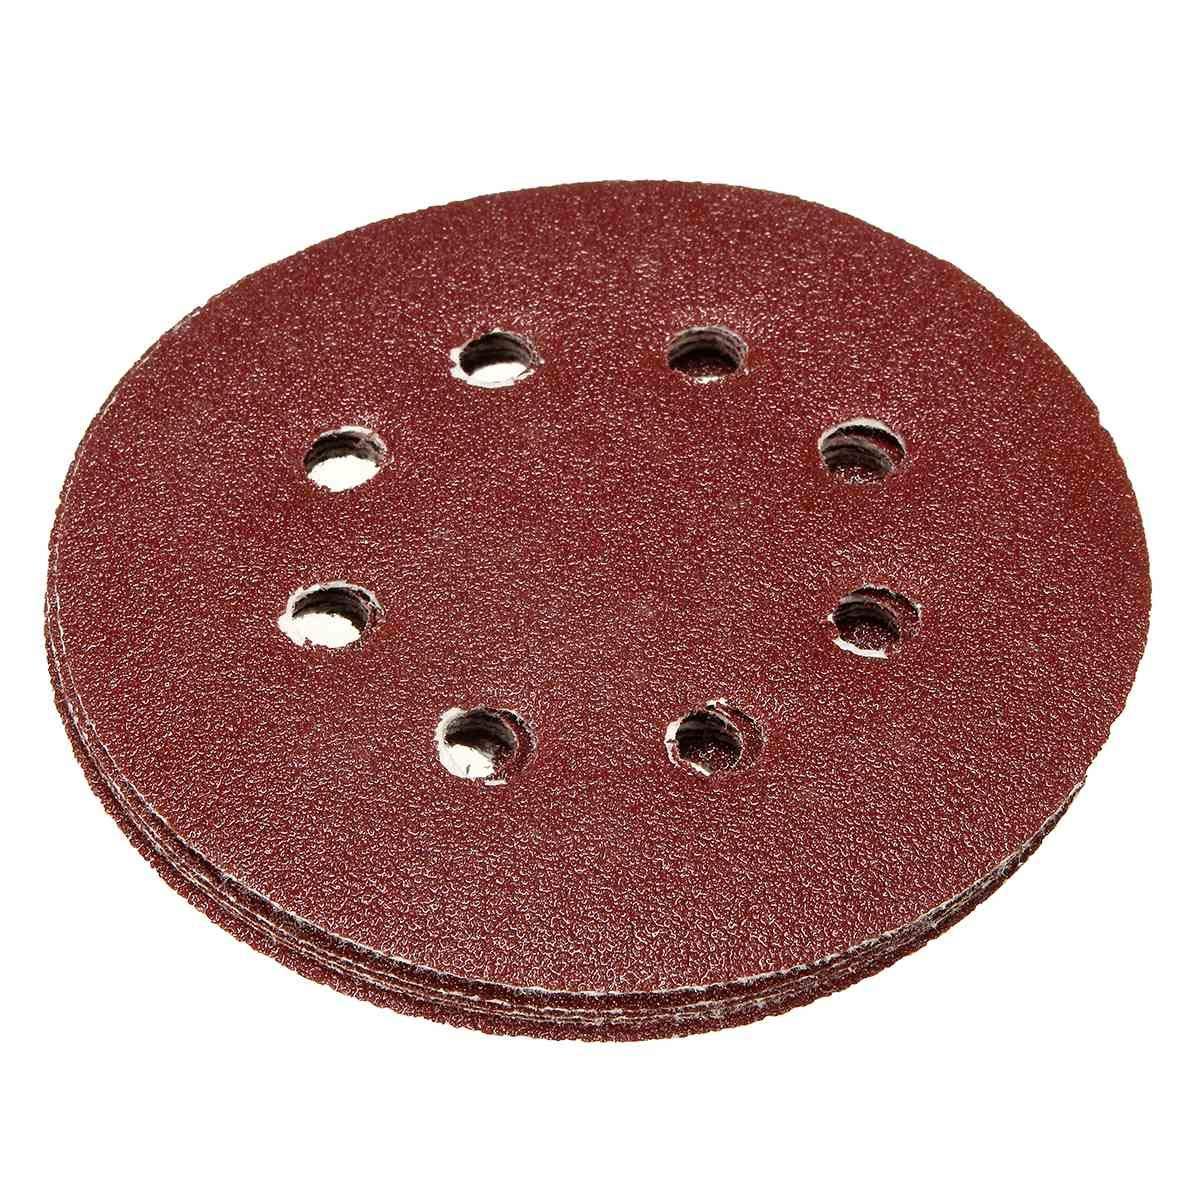 LOCHI STORE 30Pcs 5 Inch 123mm 8 Holes Polishing Sand Paper Grit 80 240 400 800 1000 2000# Sanding Discs Hook /&Loop Set for Grinding Machine NEW